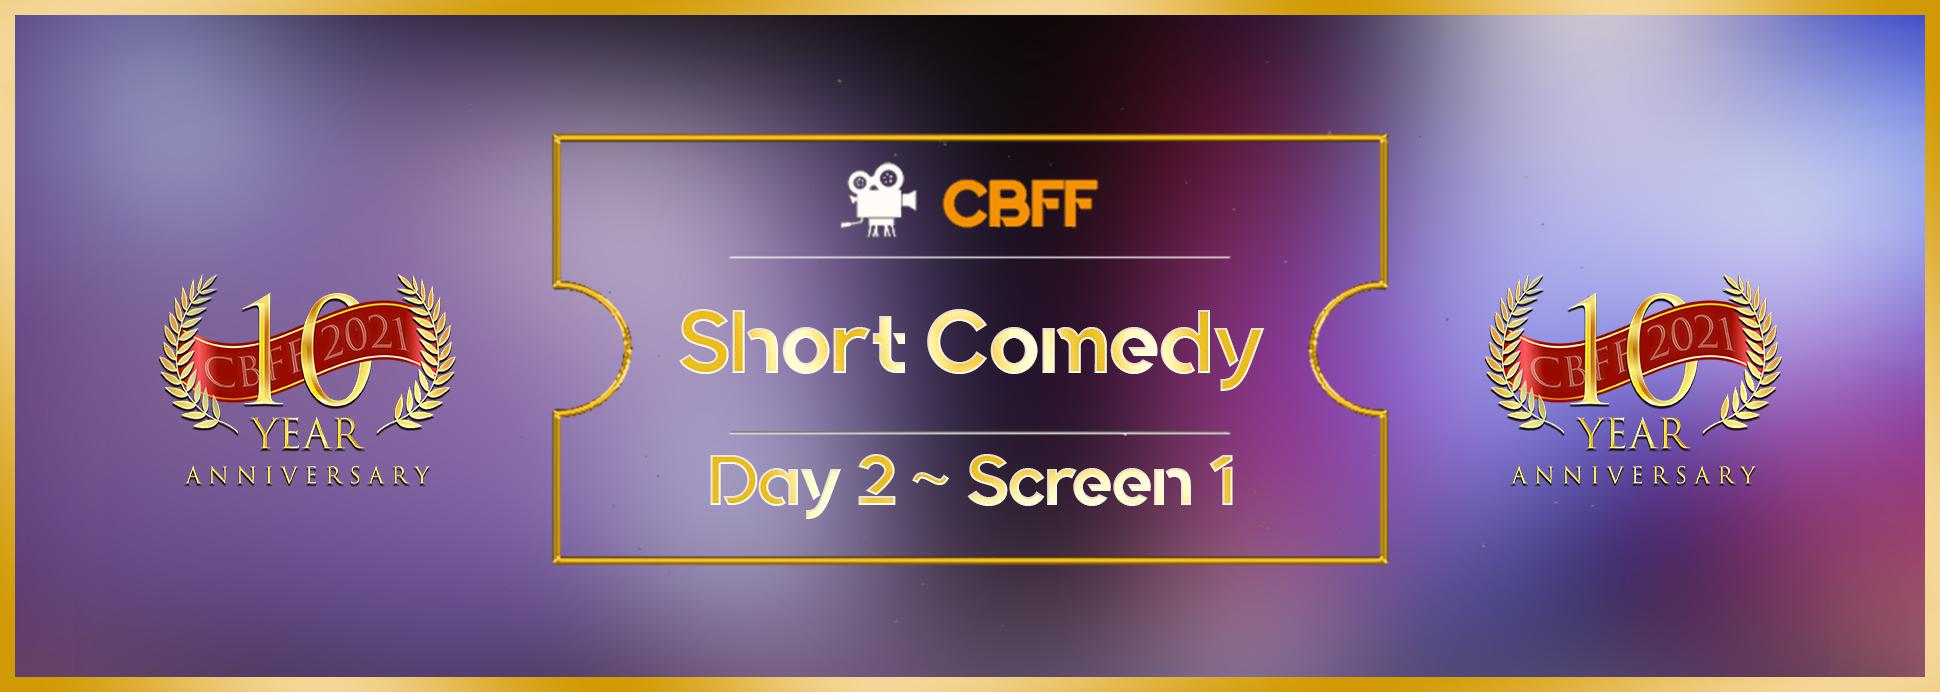 Day 2, Screen 1: Short Comedy